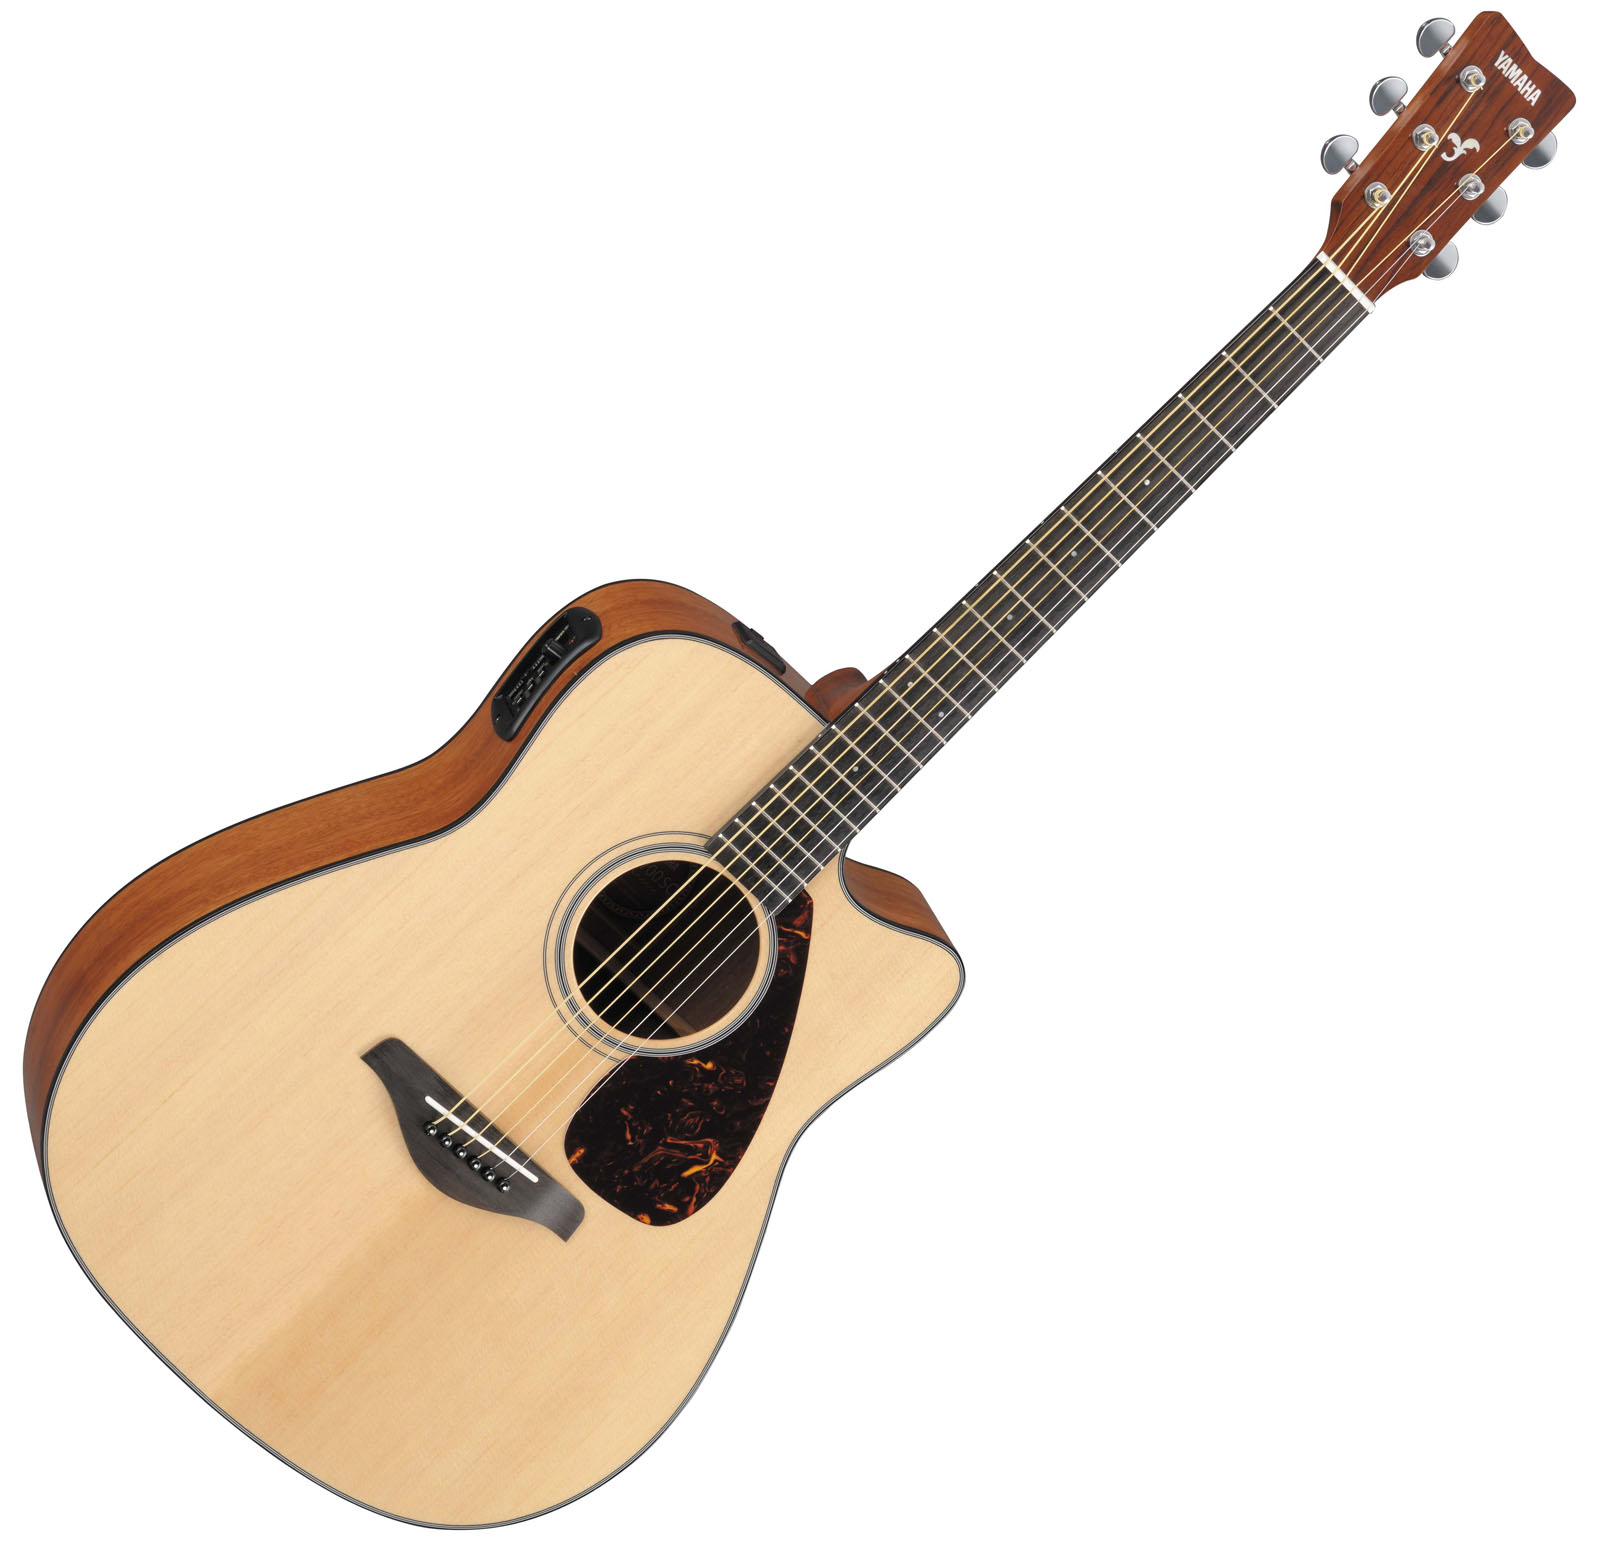 Yamaha Fgx700sc Folk Acoustic Electric Guitar Bundle